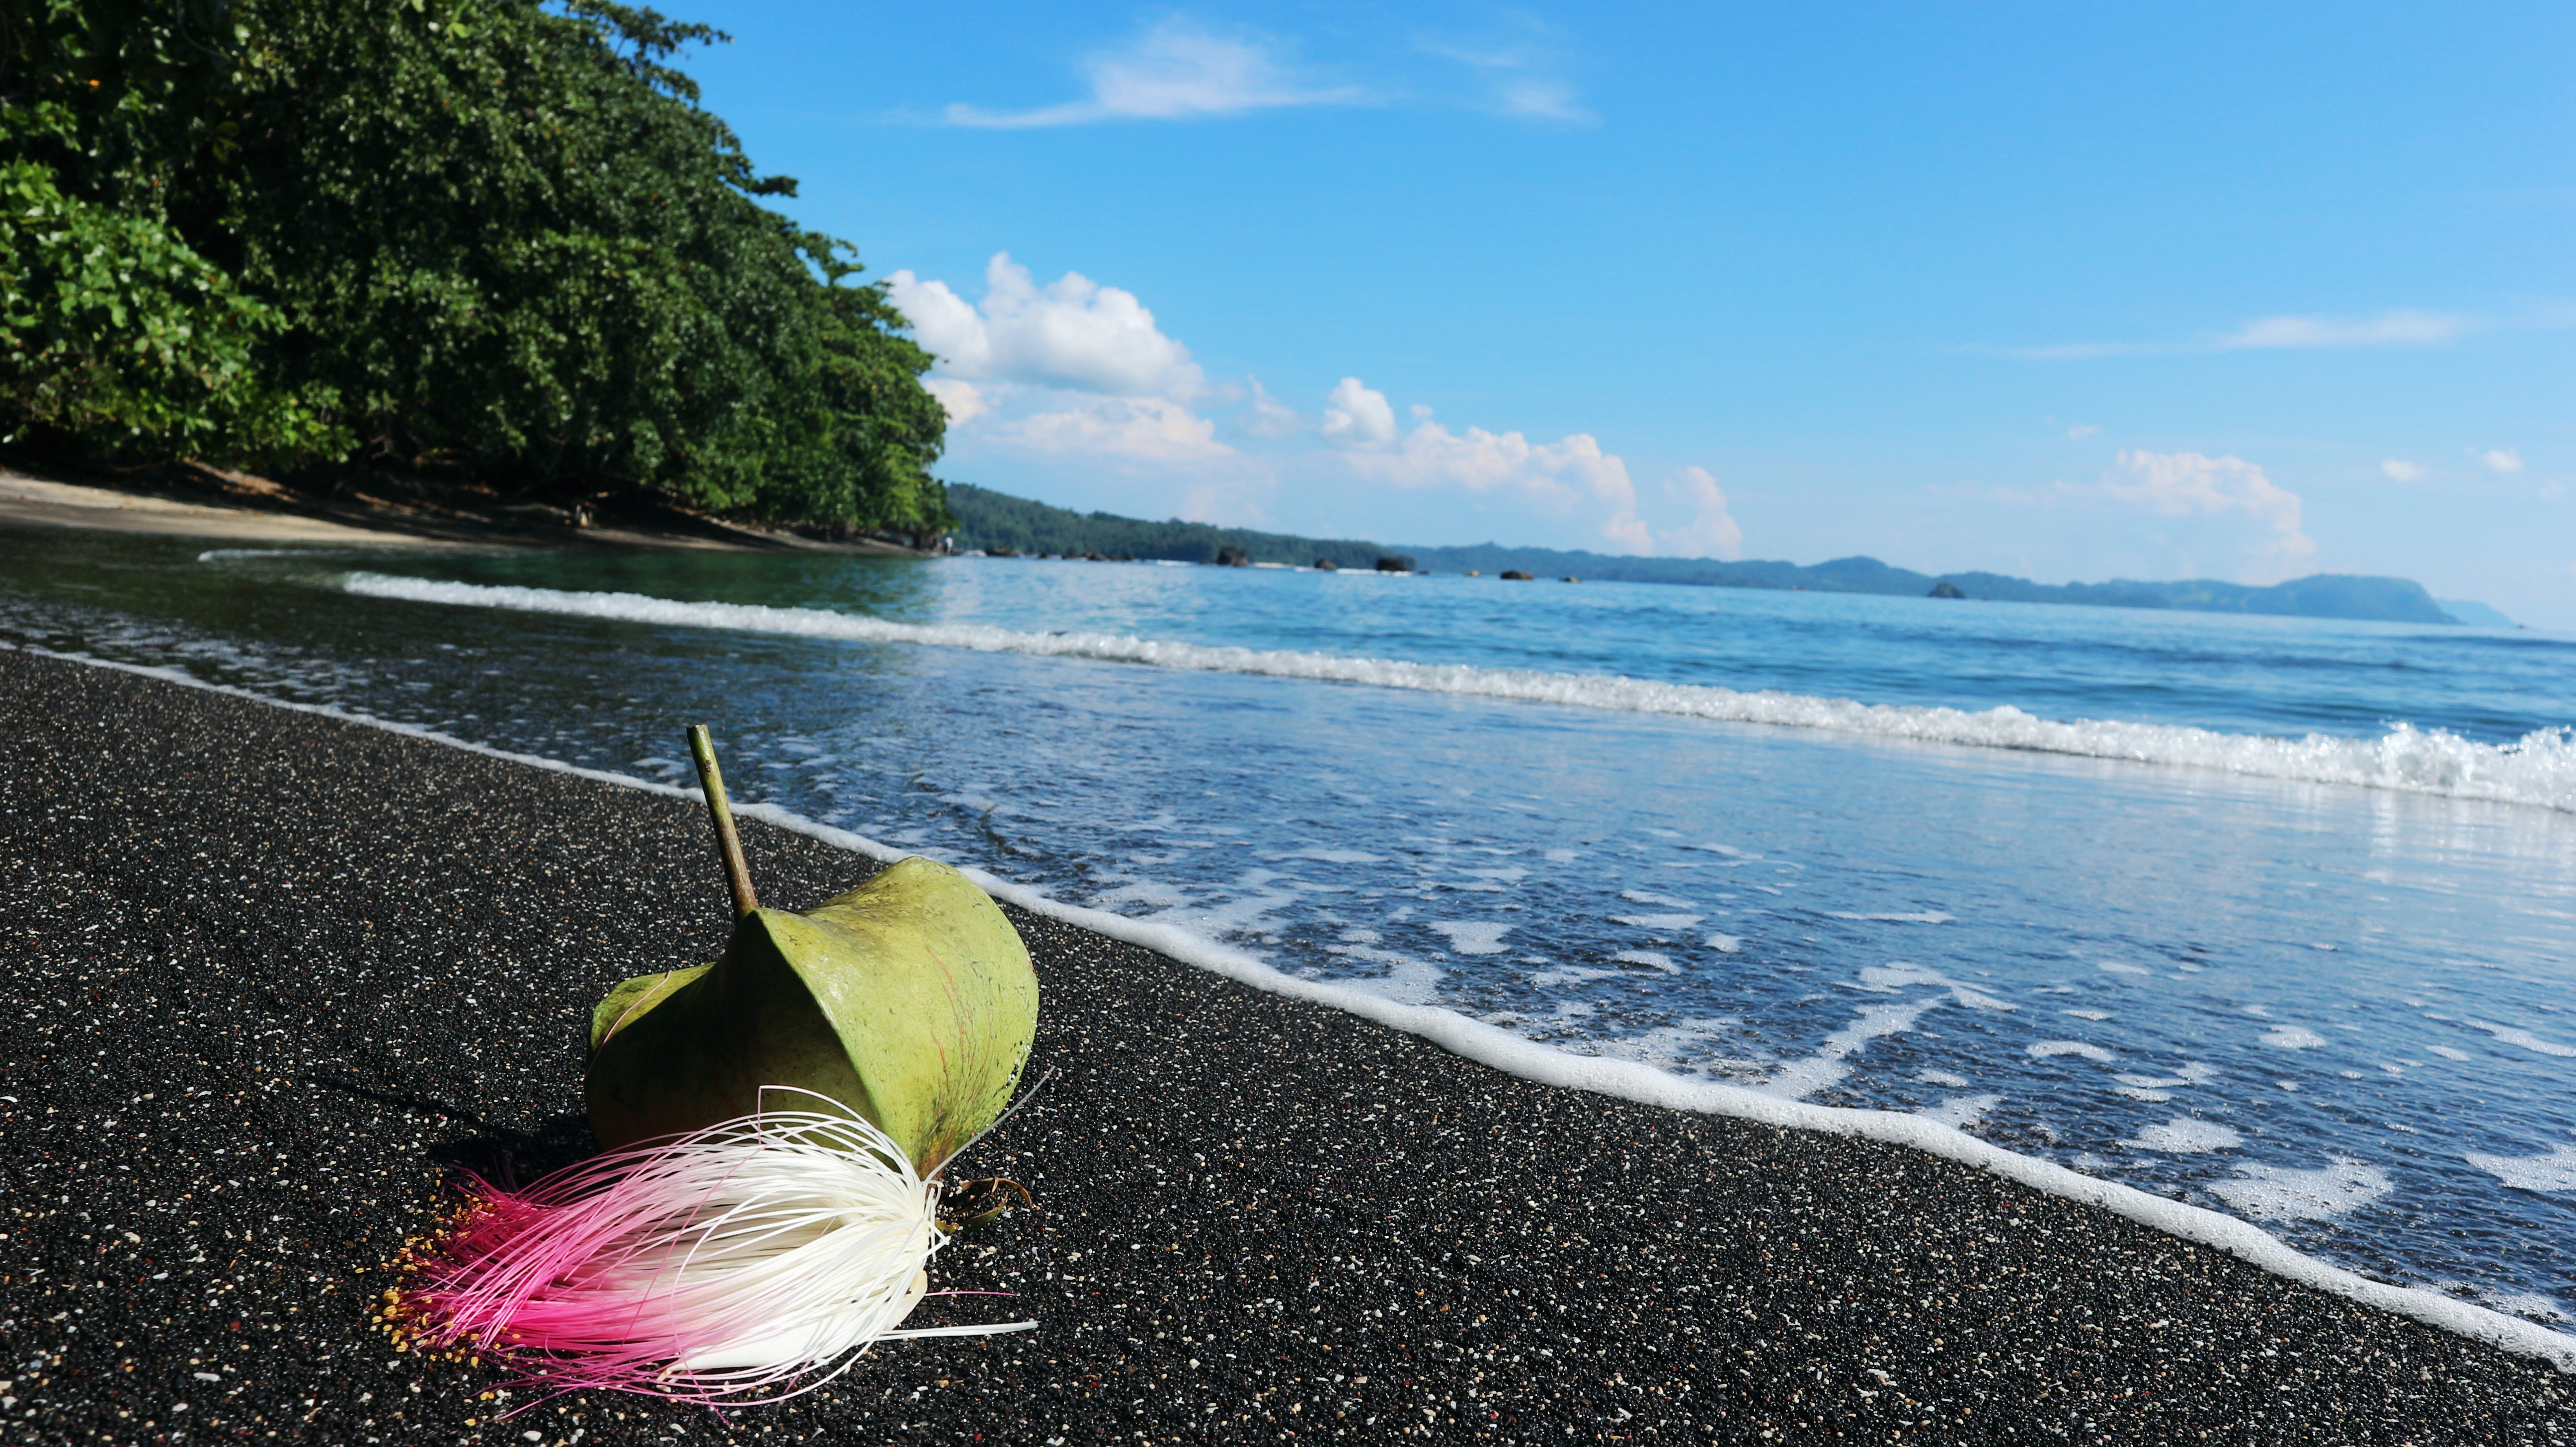 File Taman Wisata Alam Batuputih 2 Jpg Wikimedia Commons